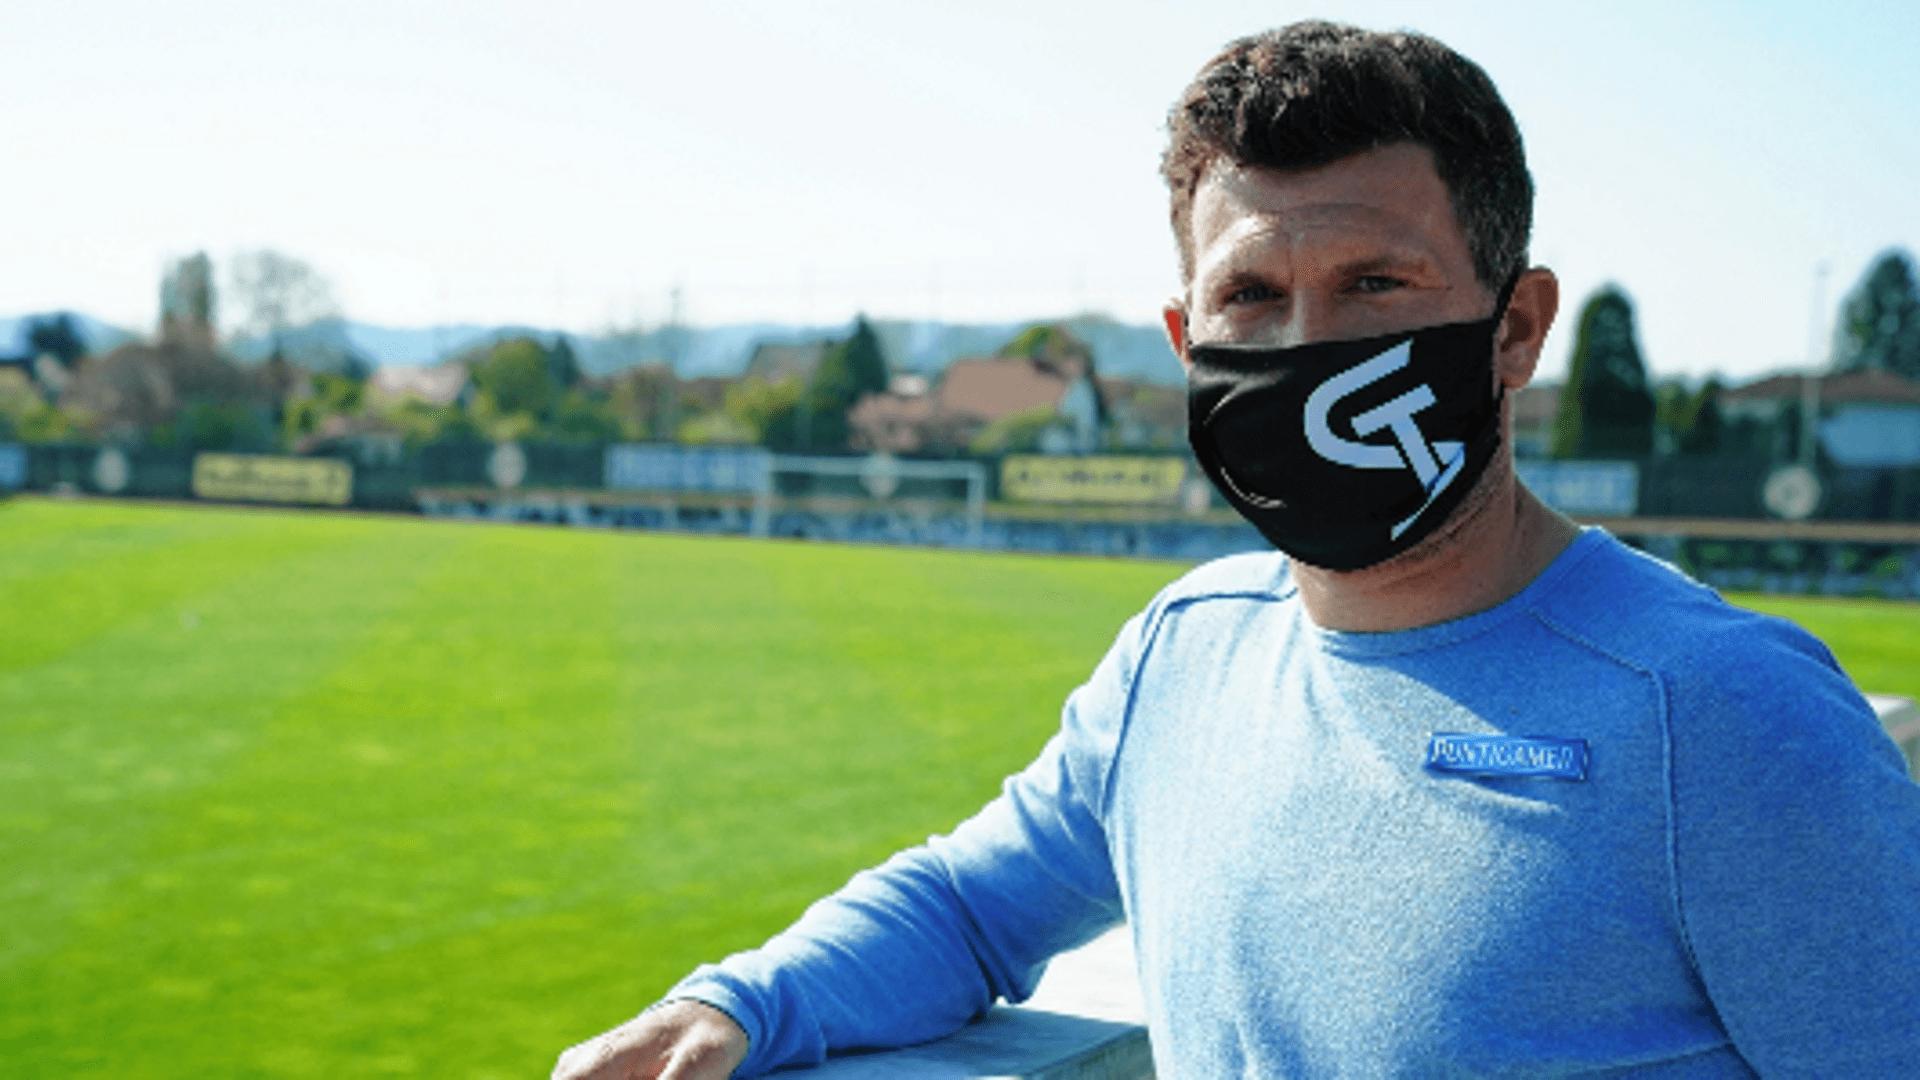 Sturm Sportdirektor Andreas Schicker